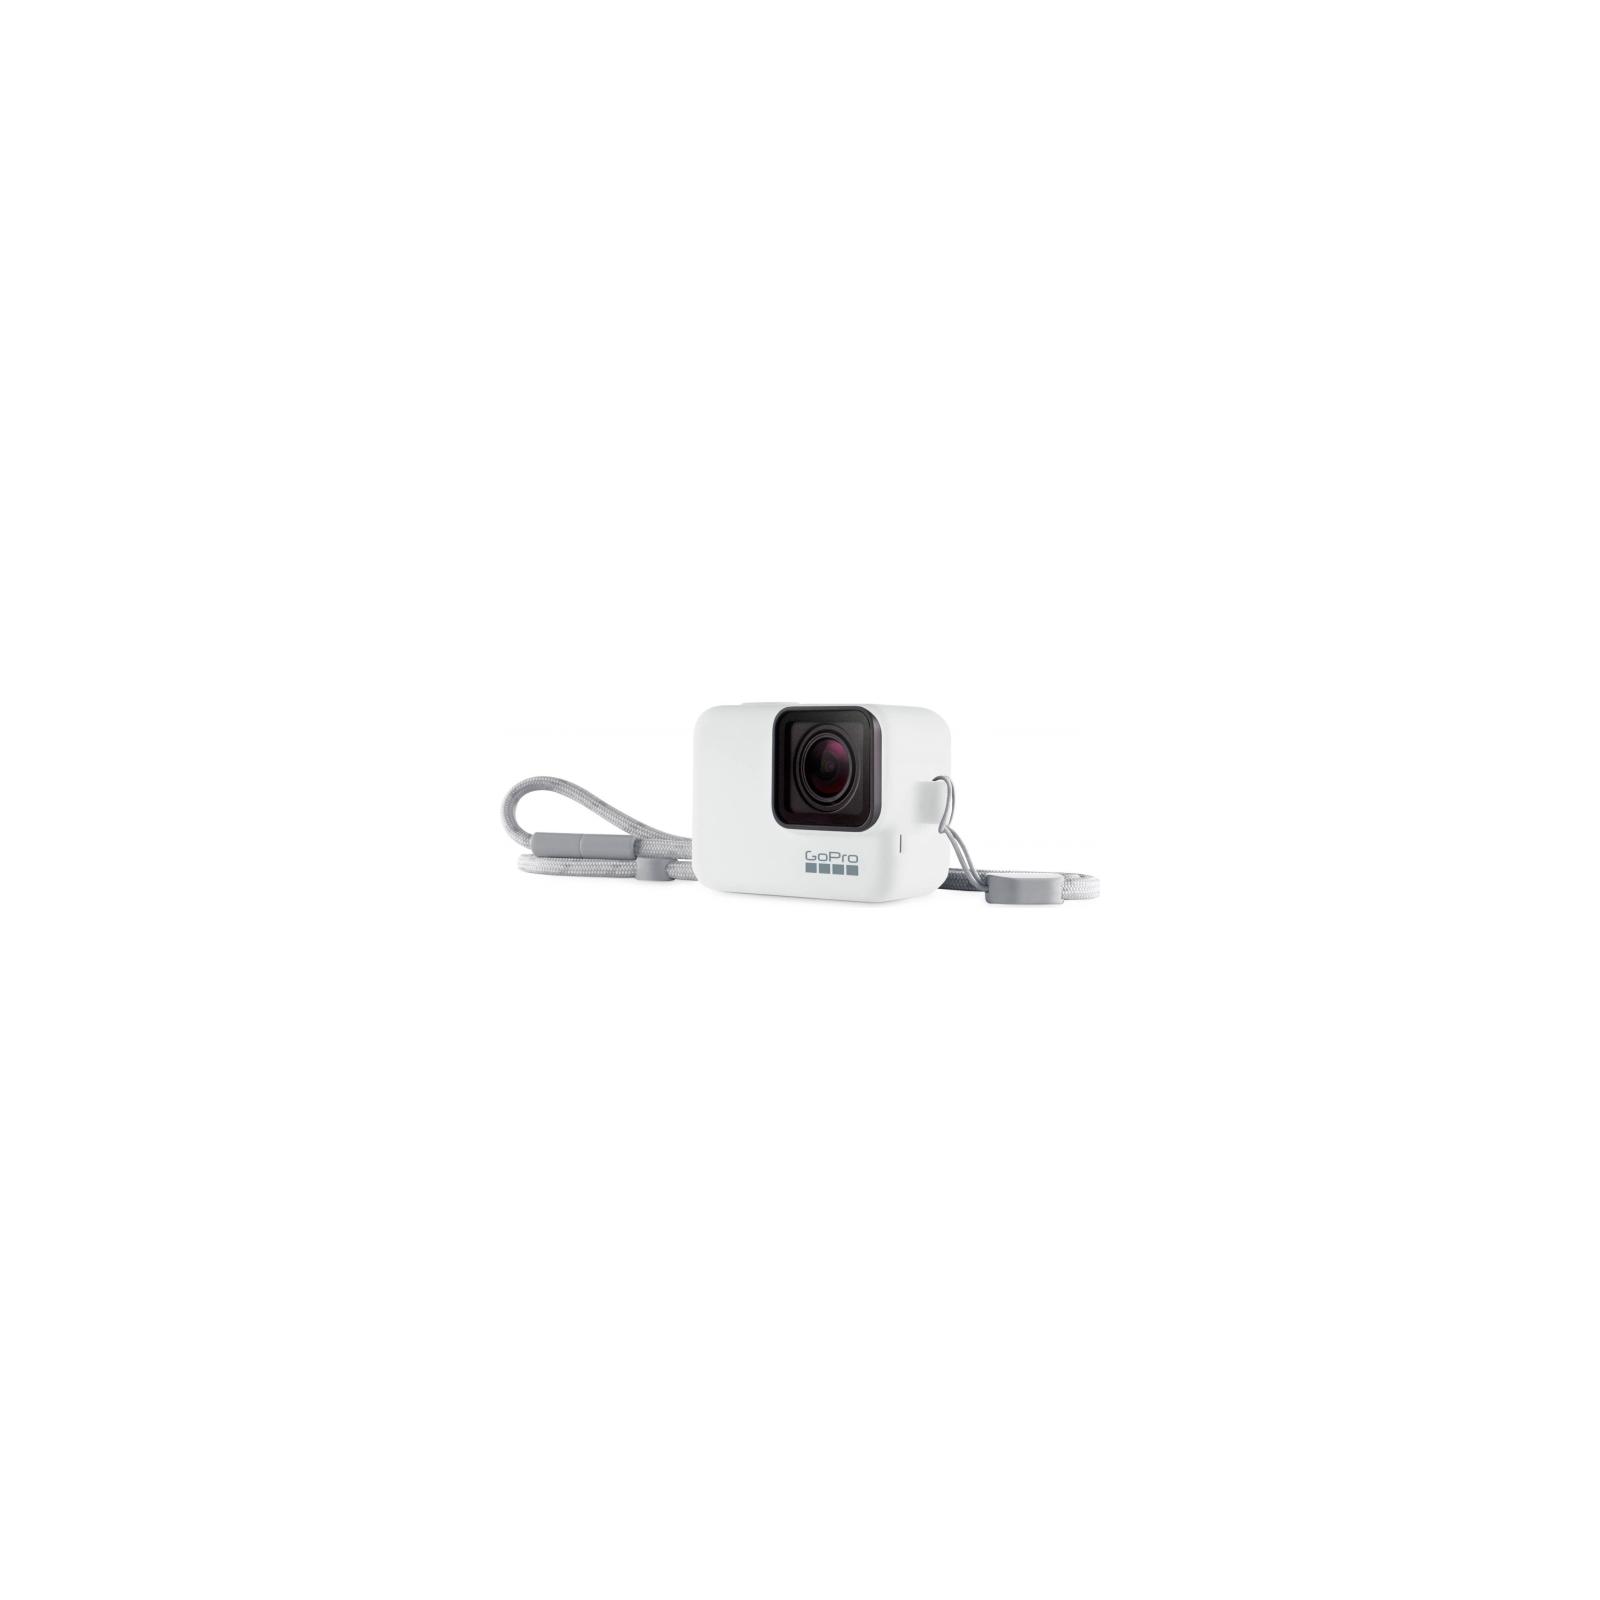 Аксессуар к экшн-камерам GoPro Sleeve & Lanyard (White) (ACSST-002) изображение 4